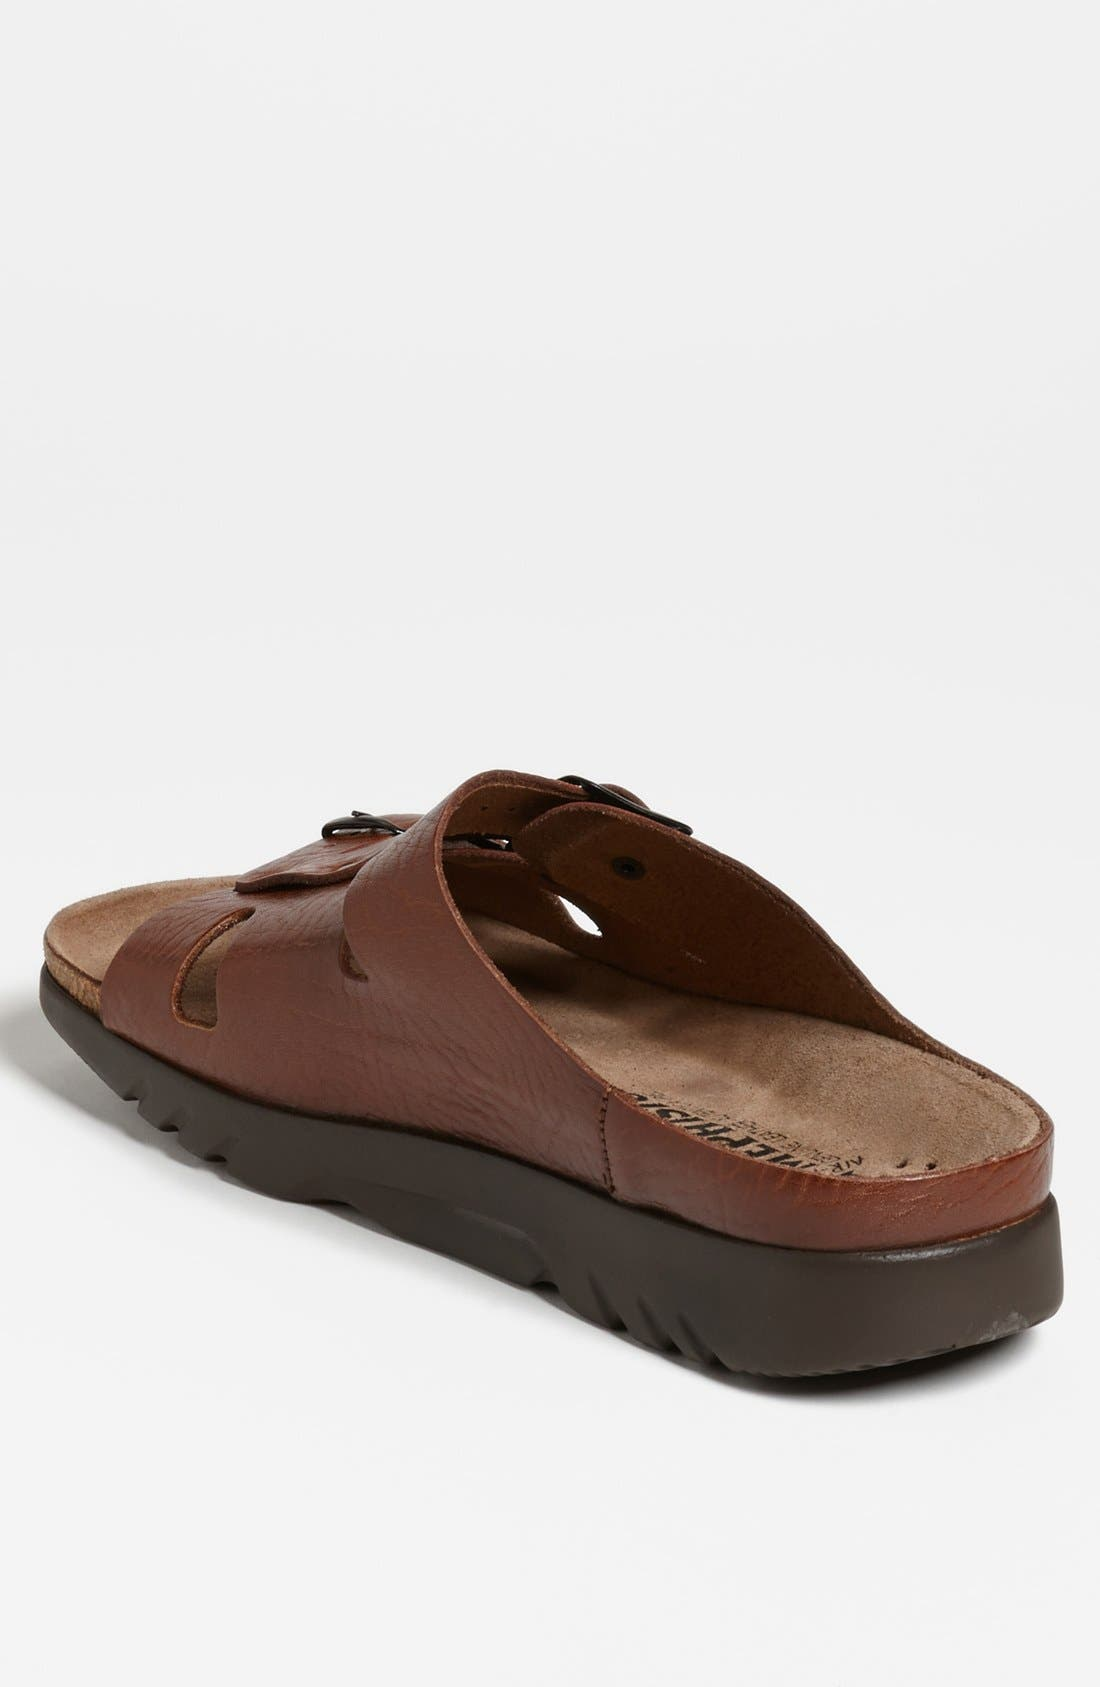 'Zach 3' Sandal,                             Alternate thumbnail 2, color,                             Tan Grain